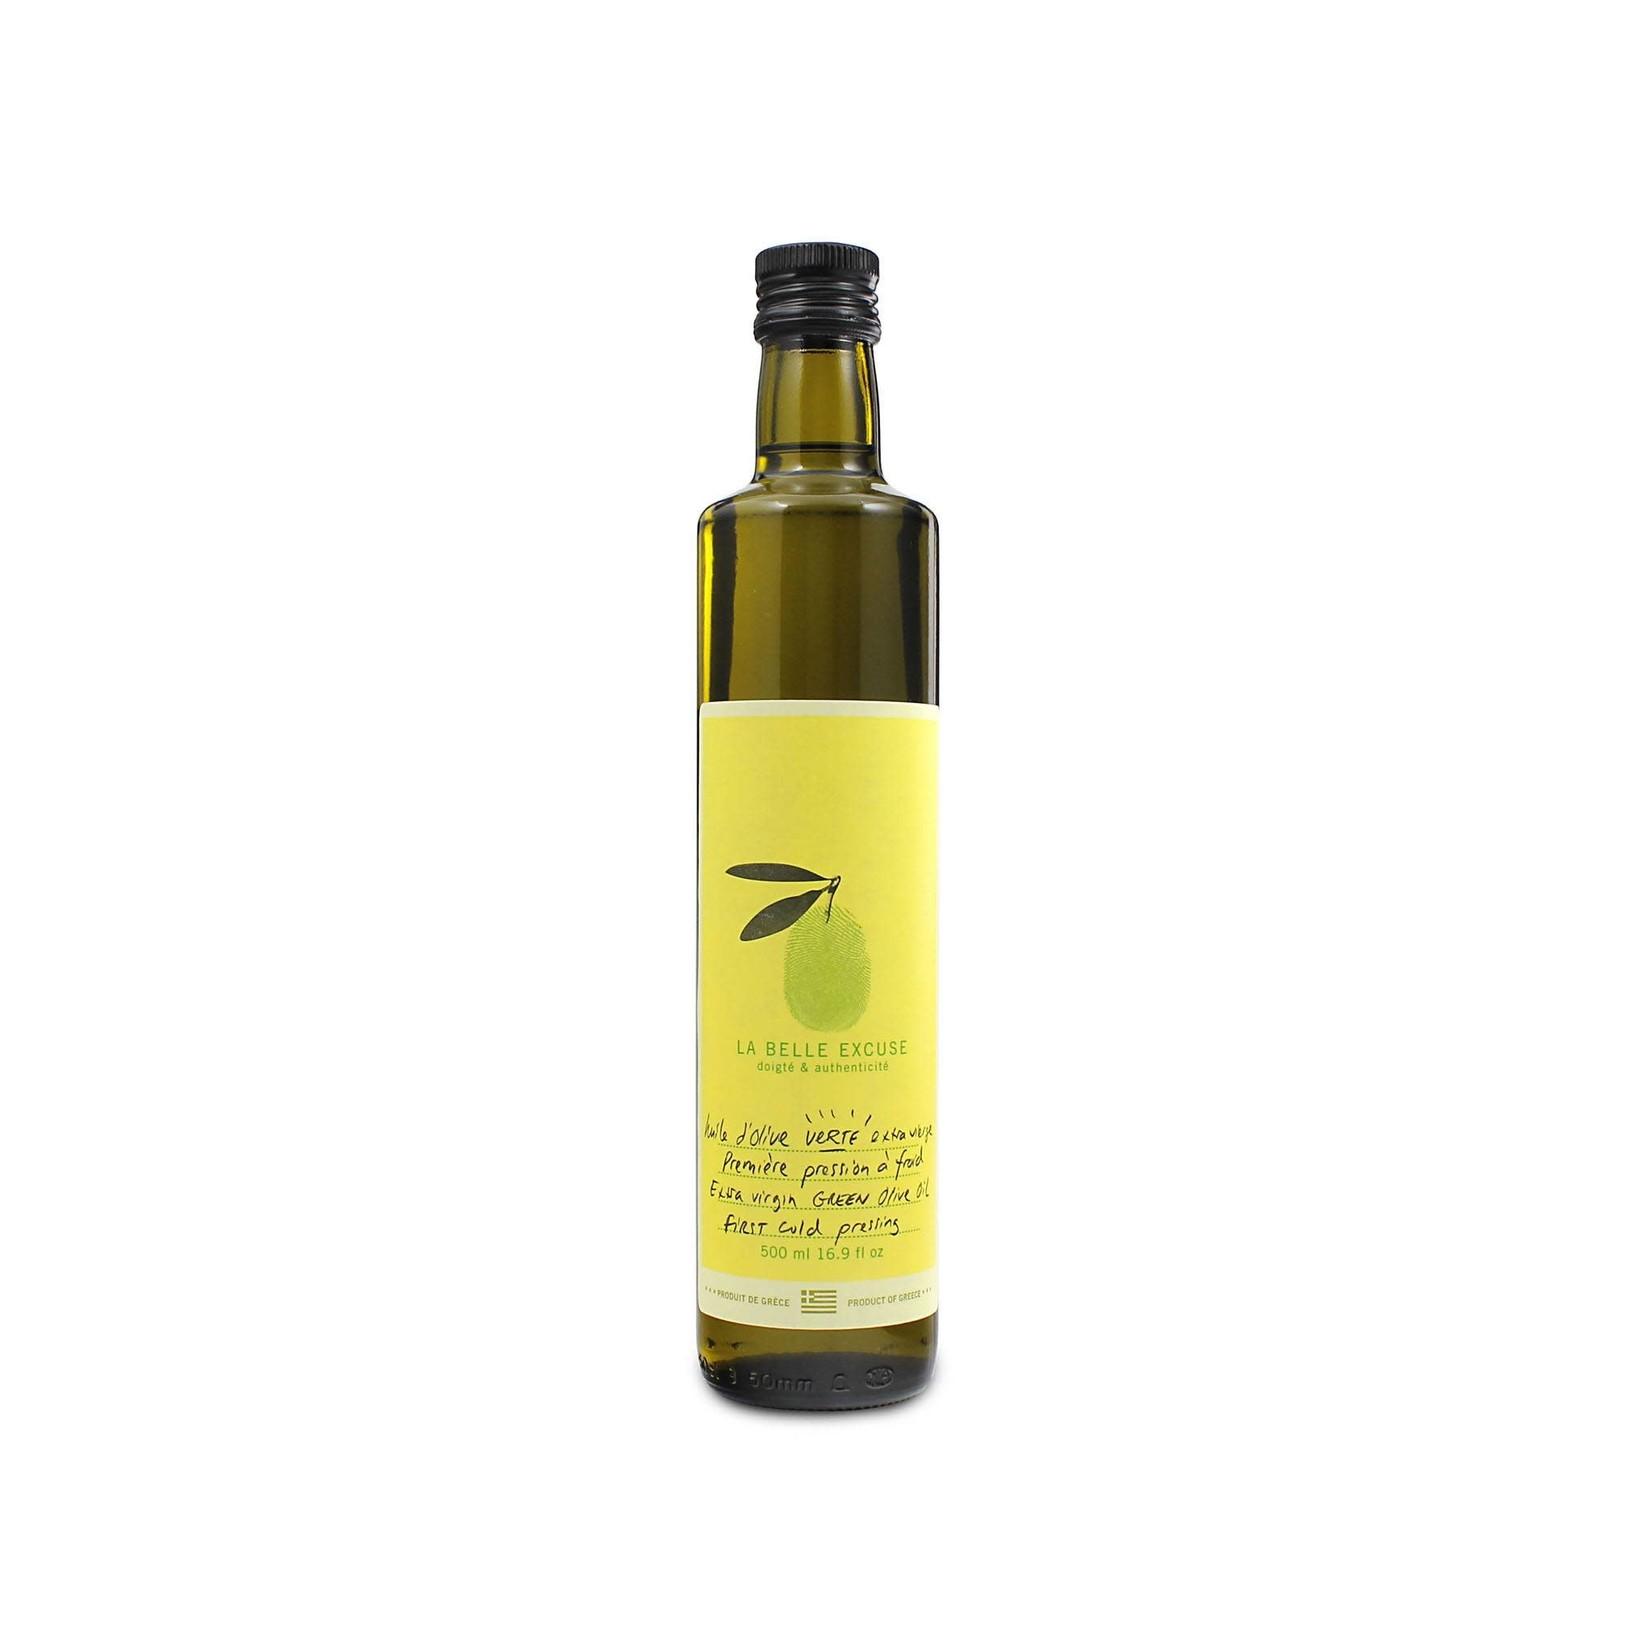 La belle excuse Huile olive extra vierge verte 500ml